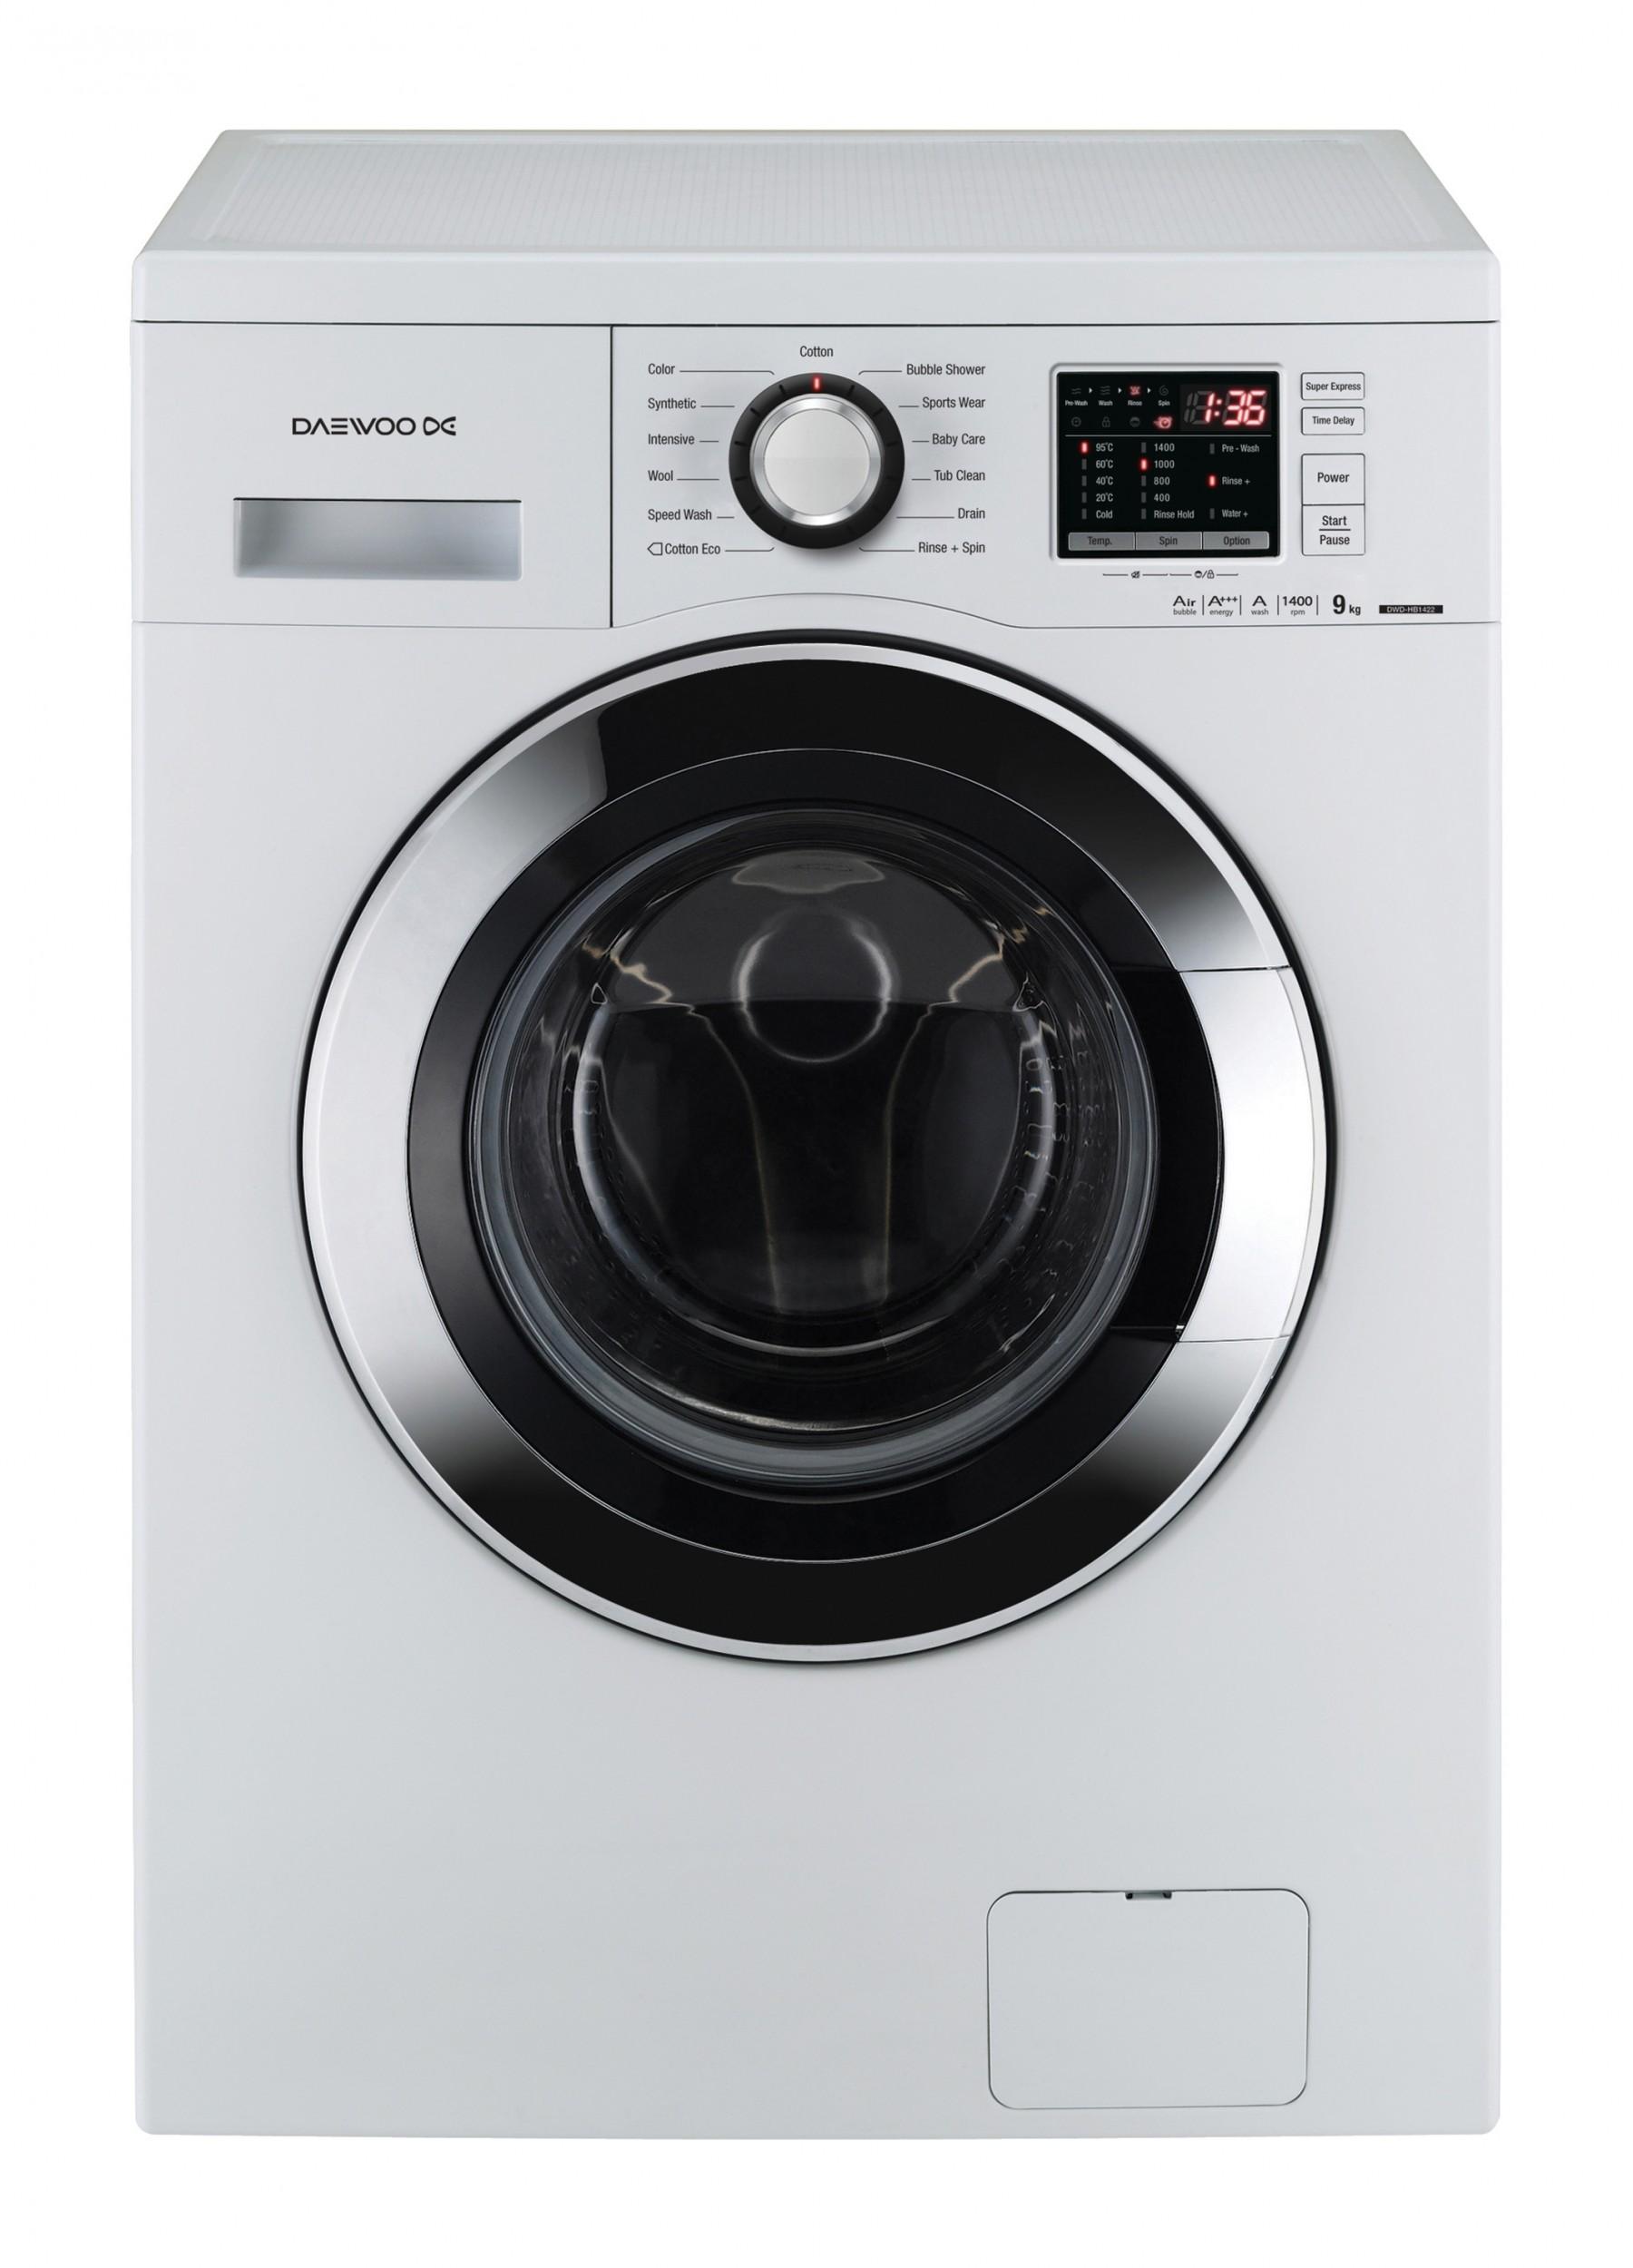 dwd hb1422ecoeu washing machine 9kg 1400rpm daewoo electronics rh daewooelectronics eu Daewoo Washer Parts Daewoo Steam Washer